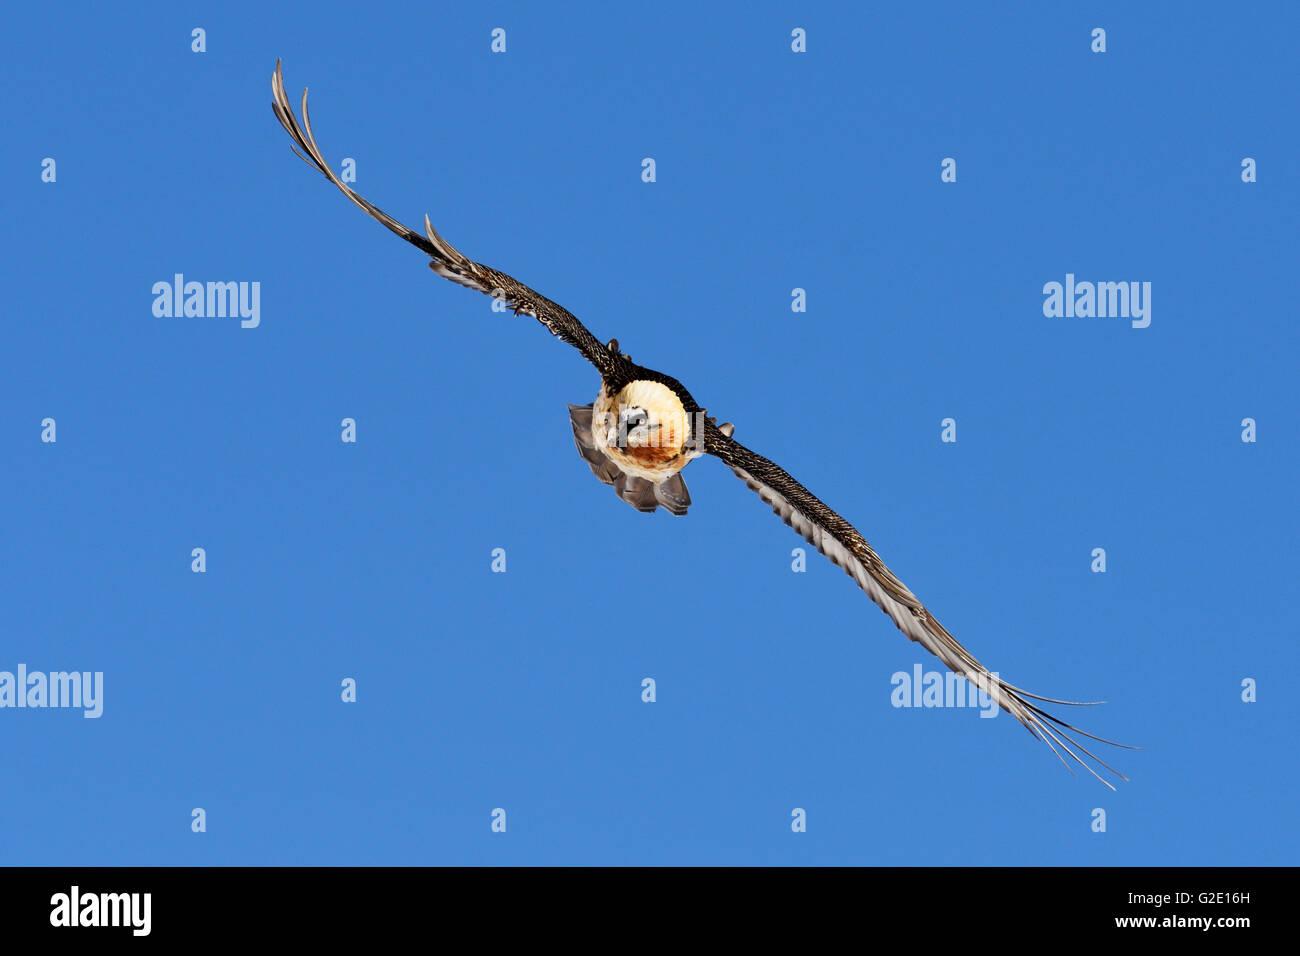 Bearded Vulture (Gypaetus barbatus) gliding, Canton of Valais, Switzerland - Stock Image